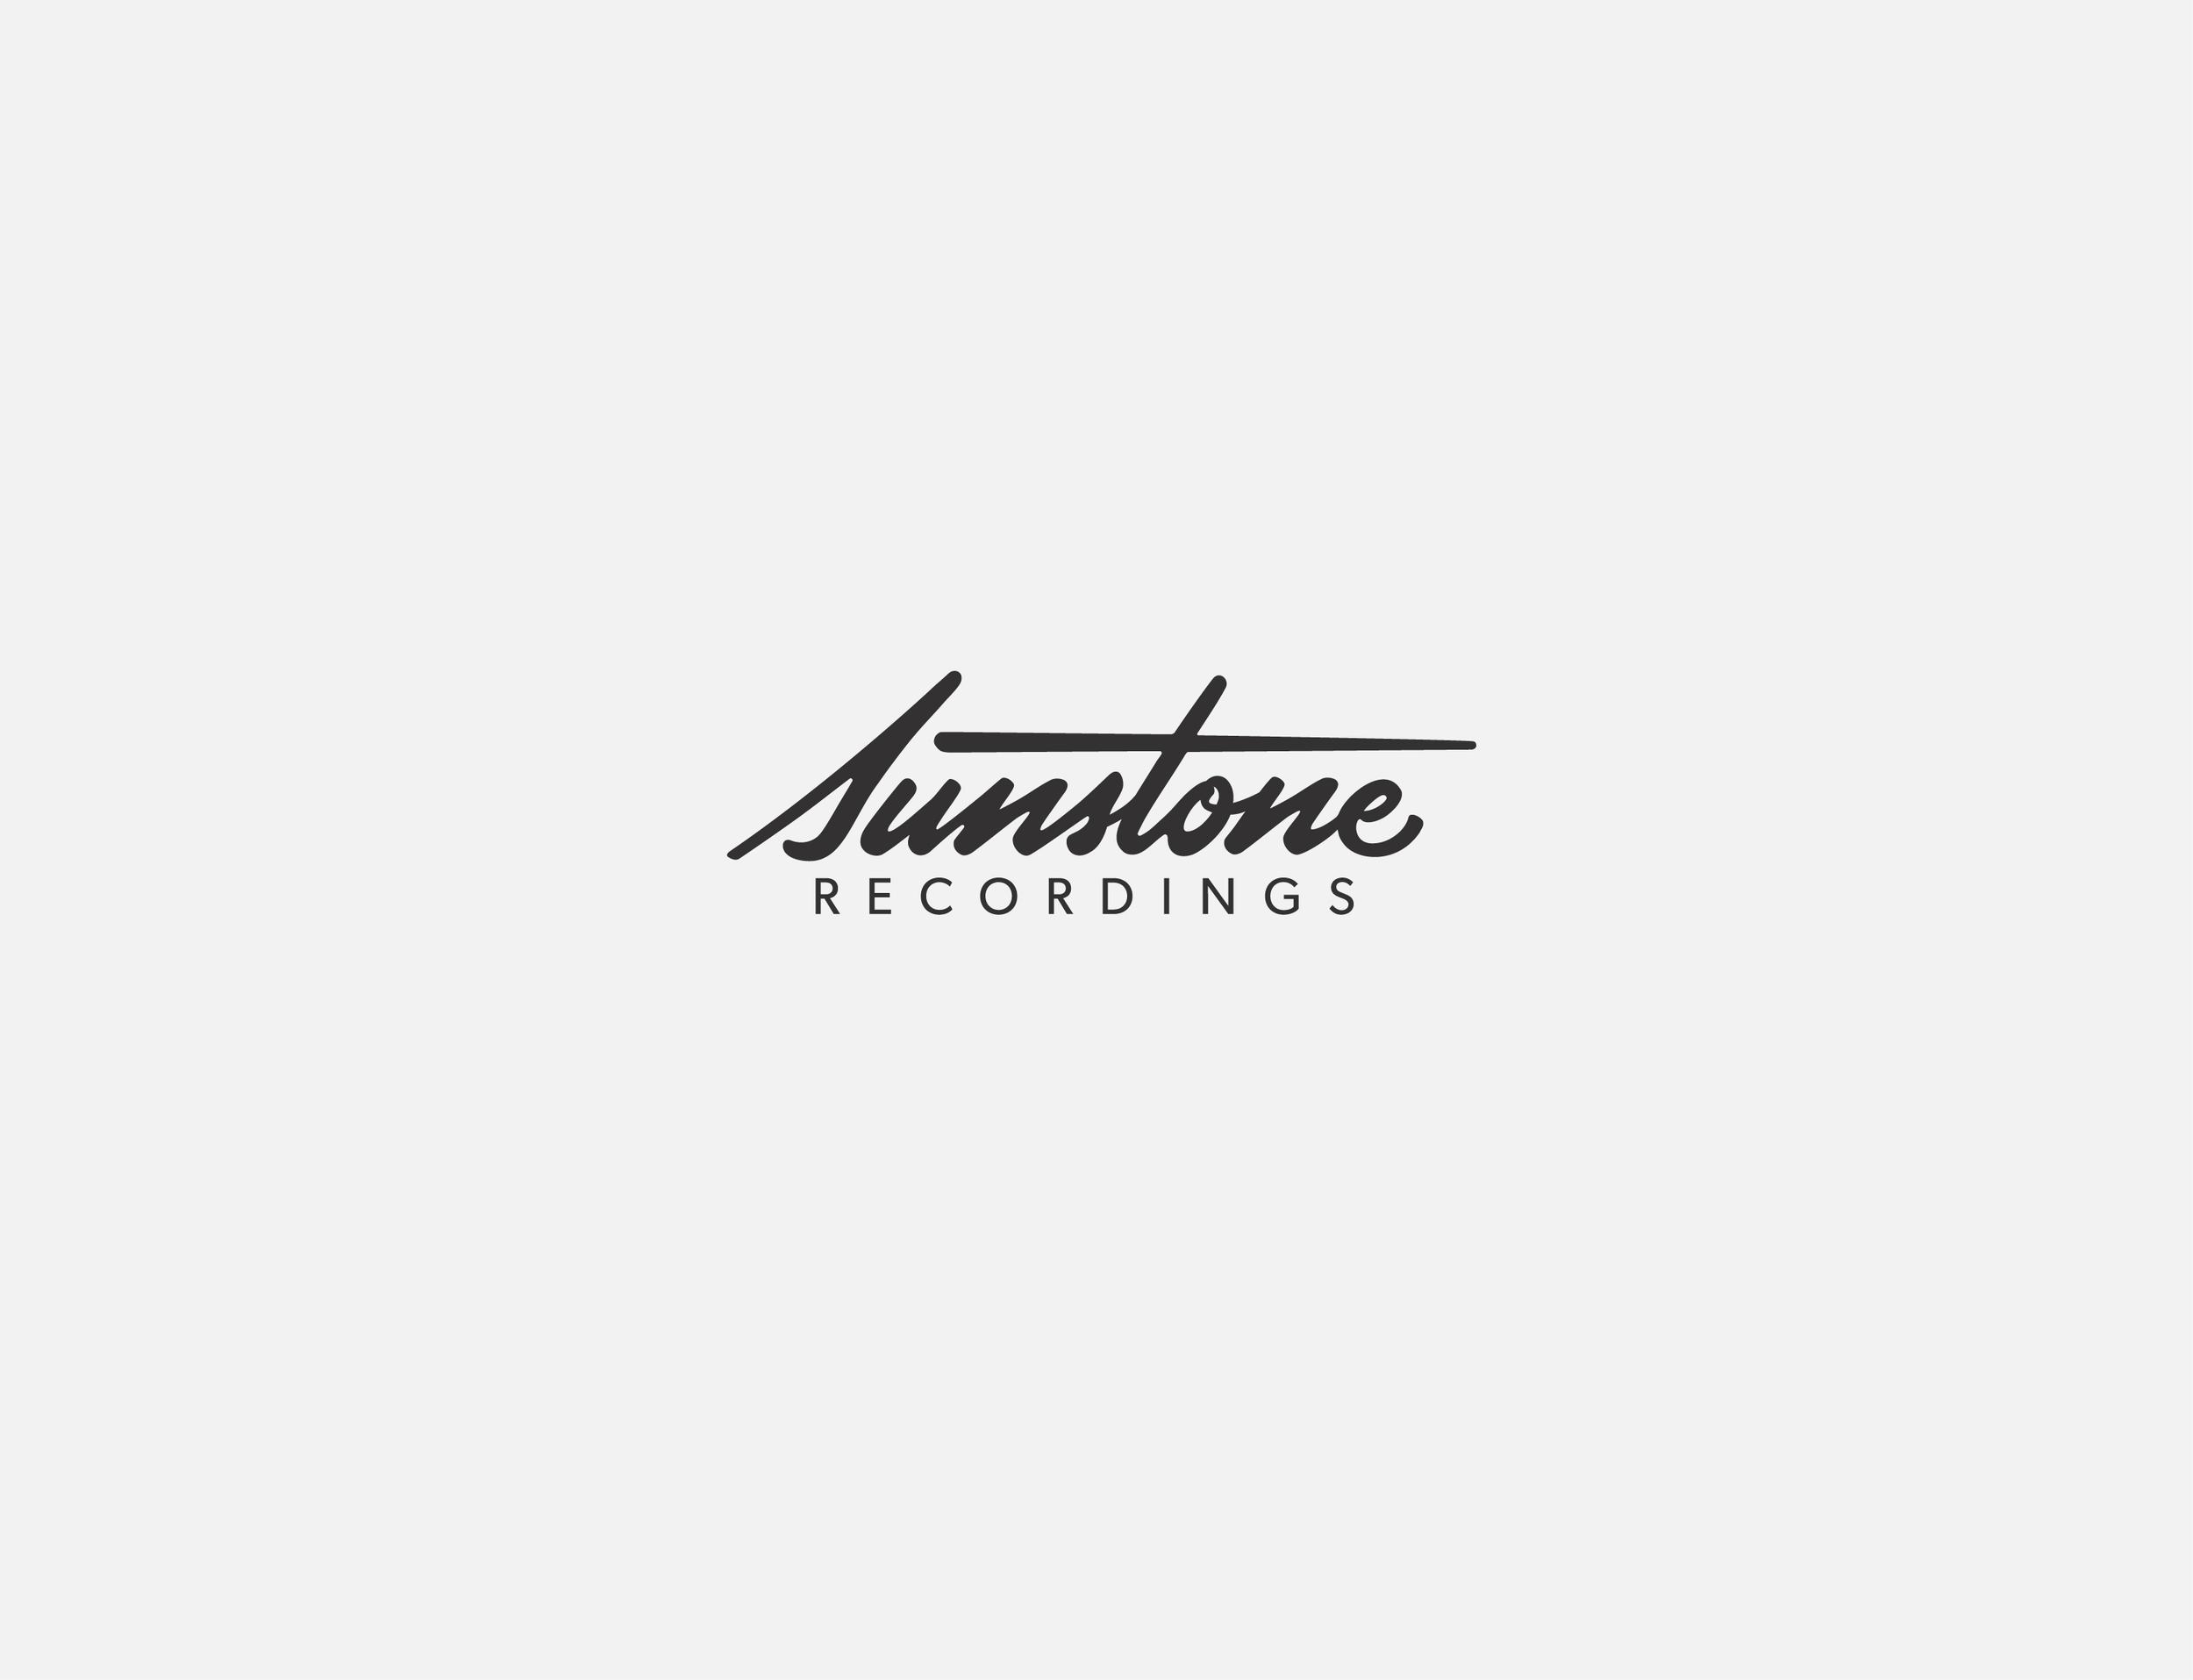 Sunstone Recordings - Black